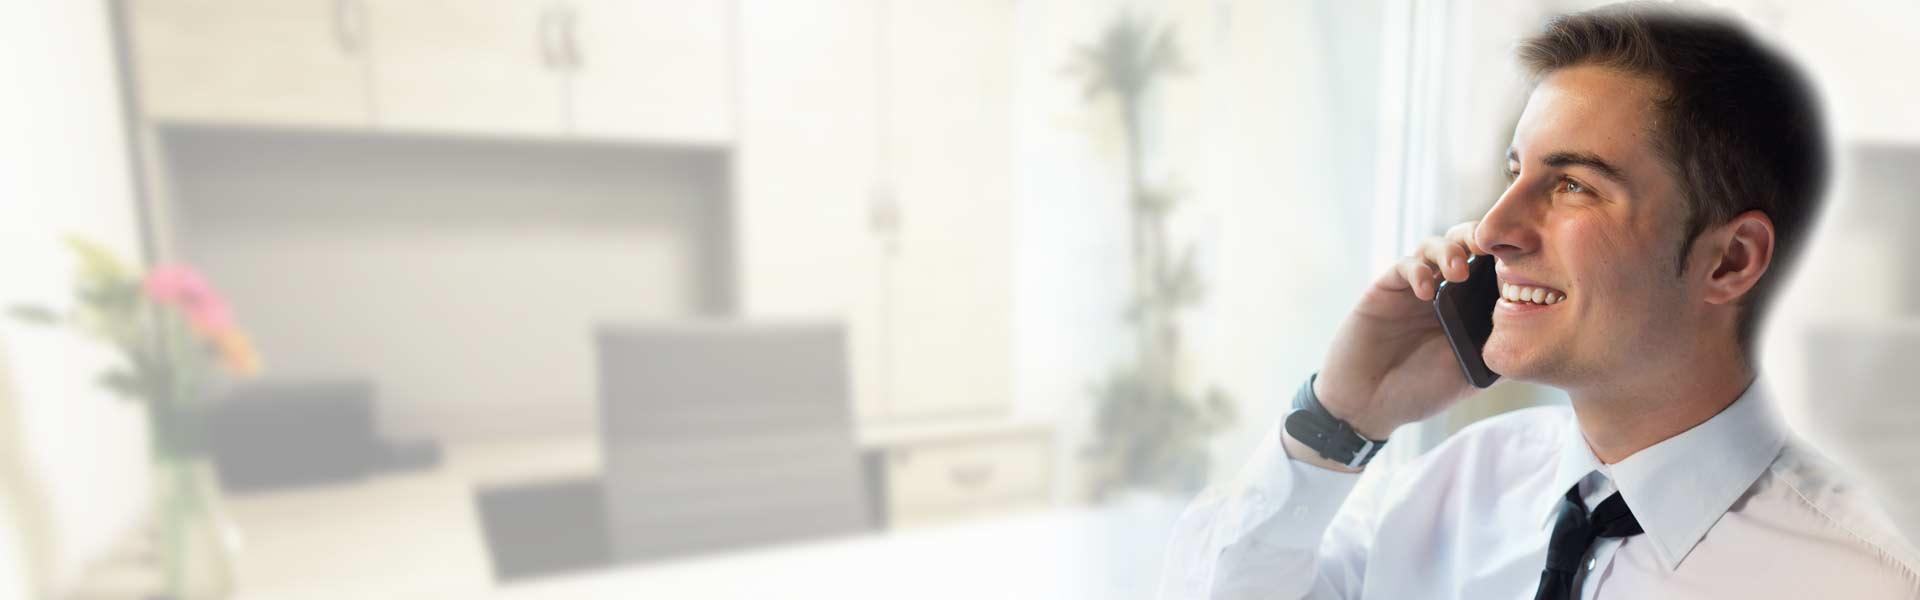 Renta de consultorios por hora df consultorios vidya for Alquiler de oficinas por horas